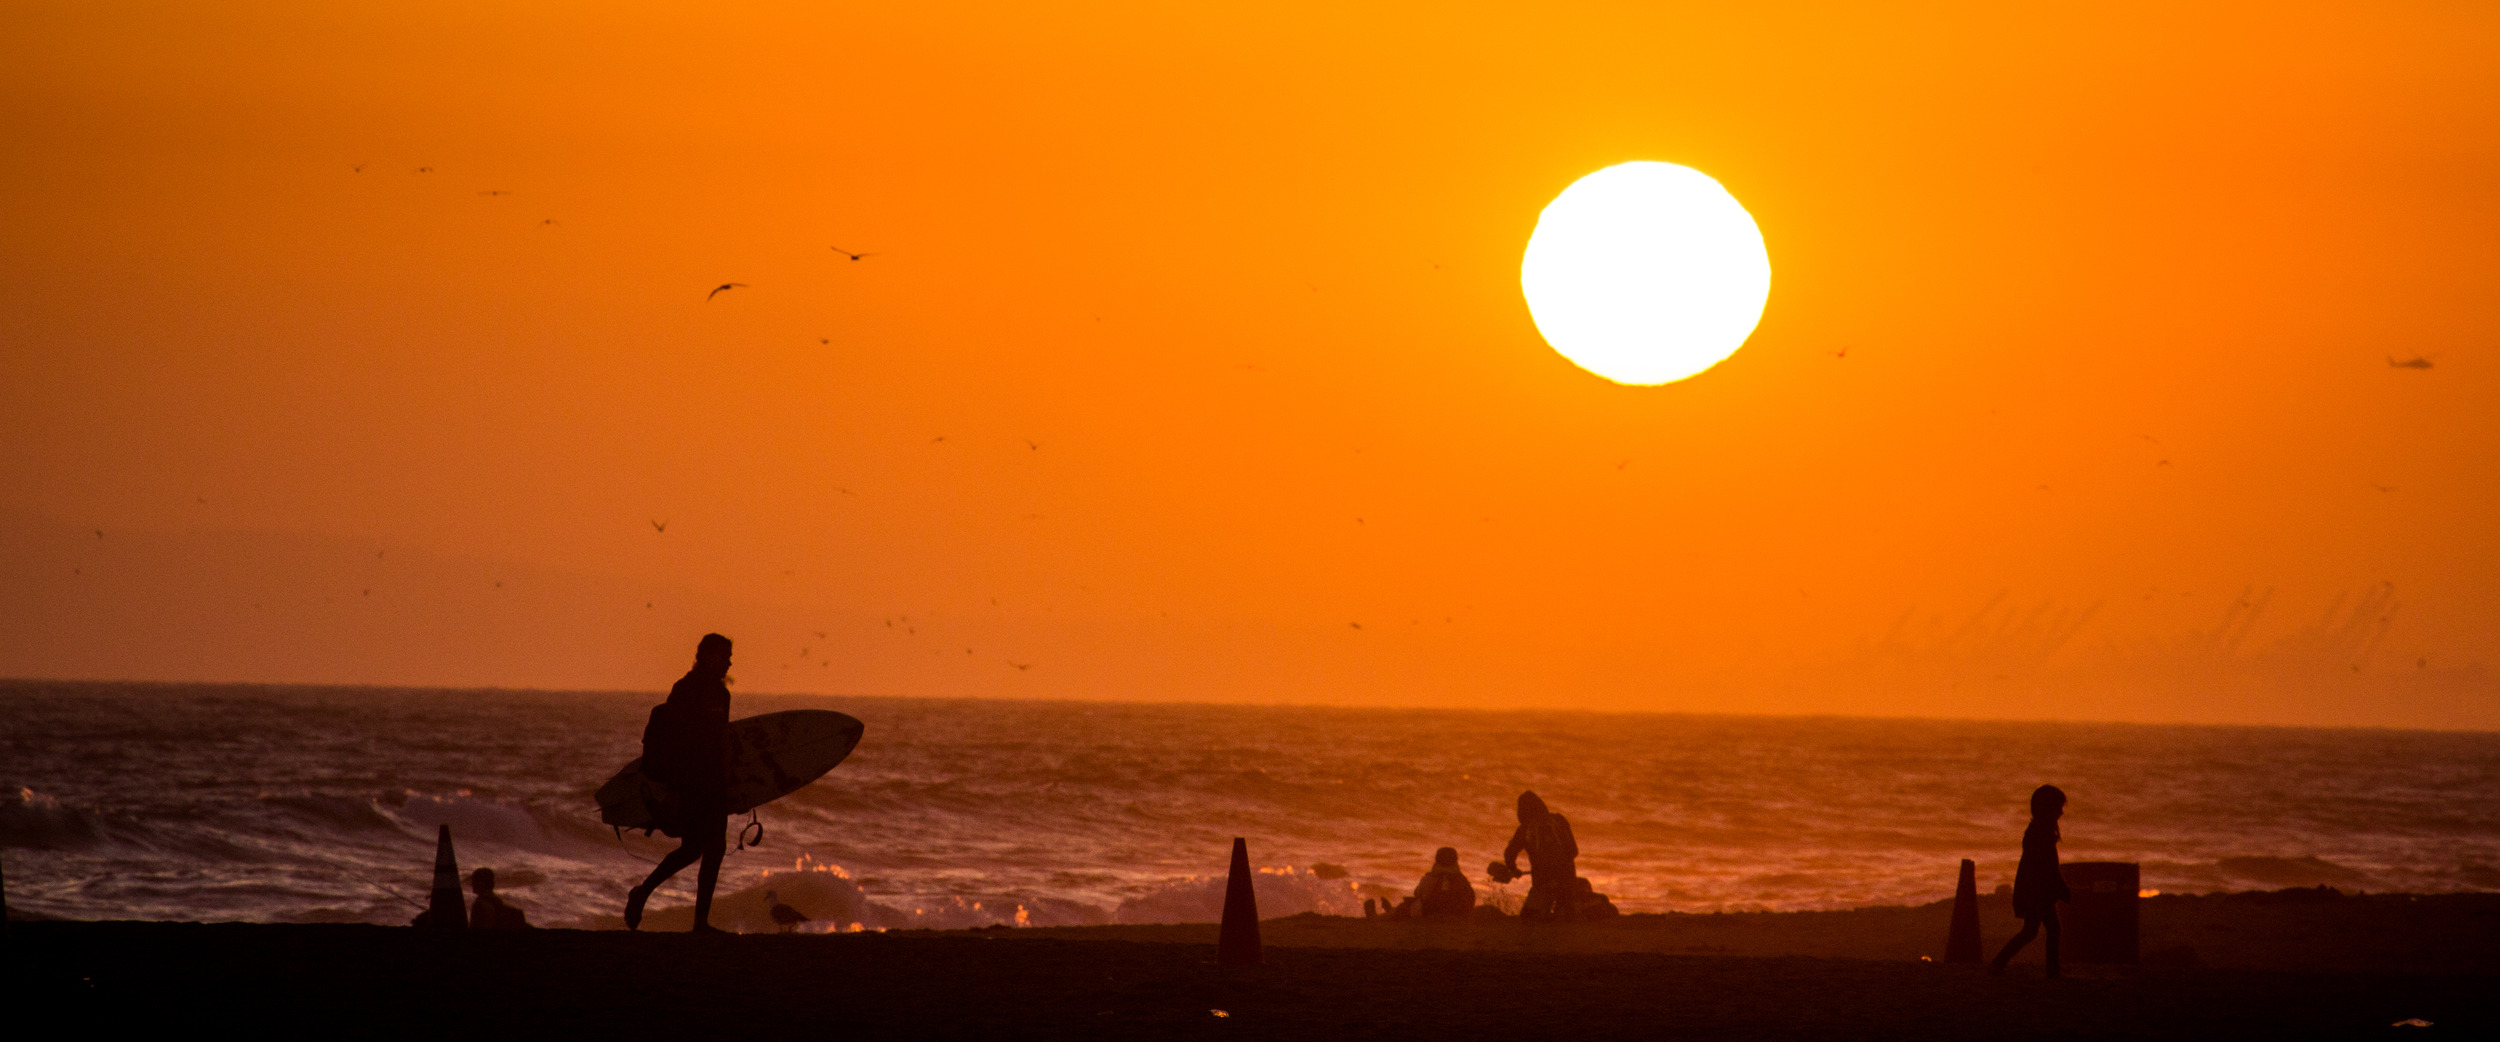 Surfer dude - Huntington Beach, CA 2014 - 5DIII